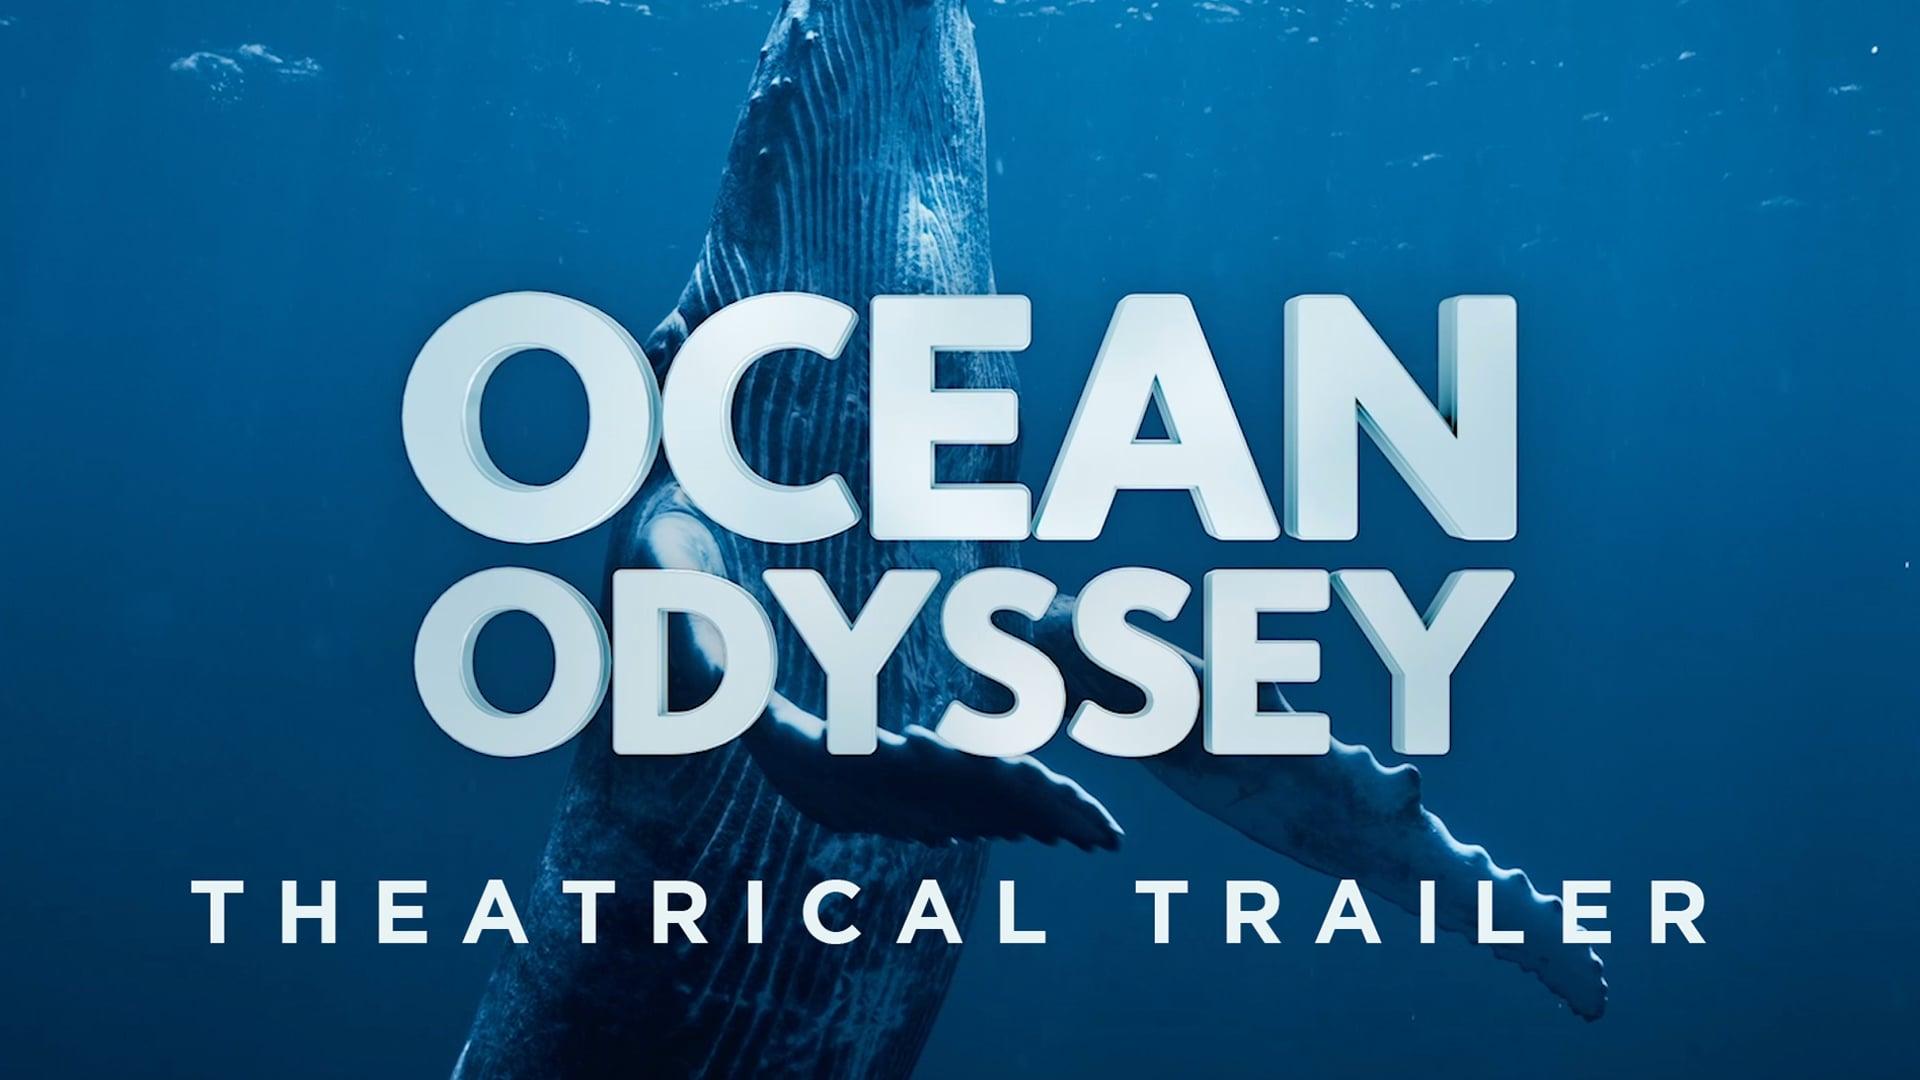 Ocean Odyssey - Theatrical Trailer